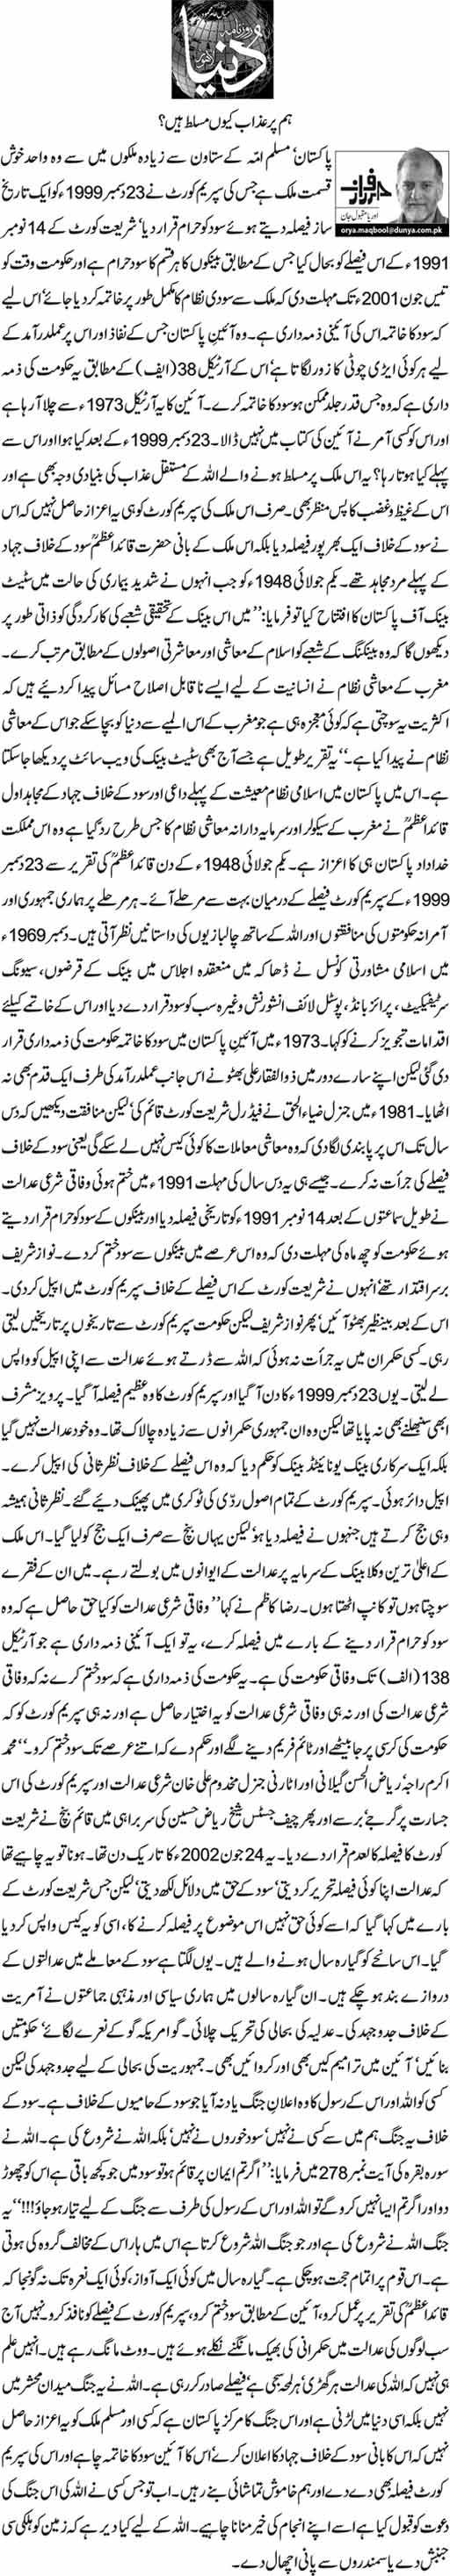 Hum Par Azab Kyn Musallat Hain? - Orya Maqbool Jan